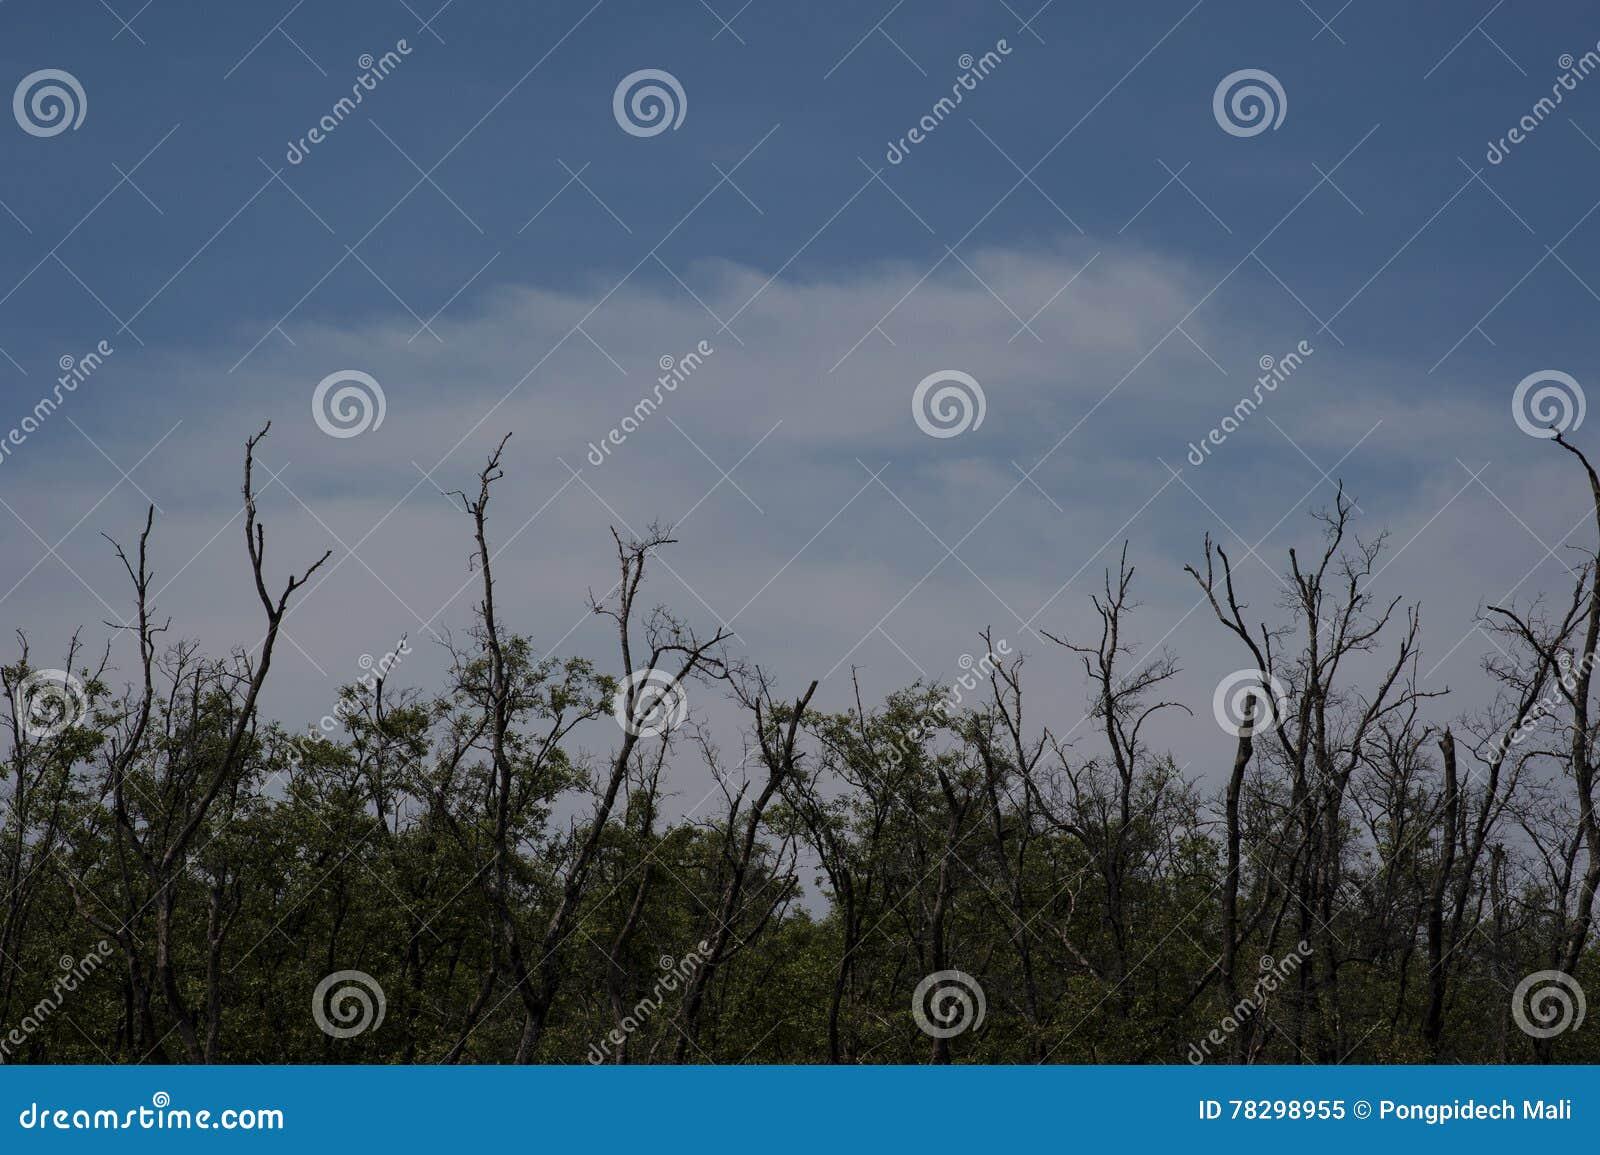 Tree with cloud blu sky